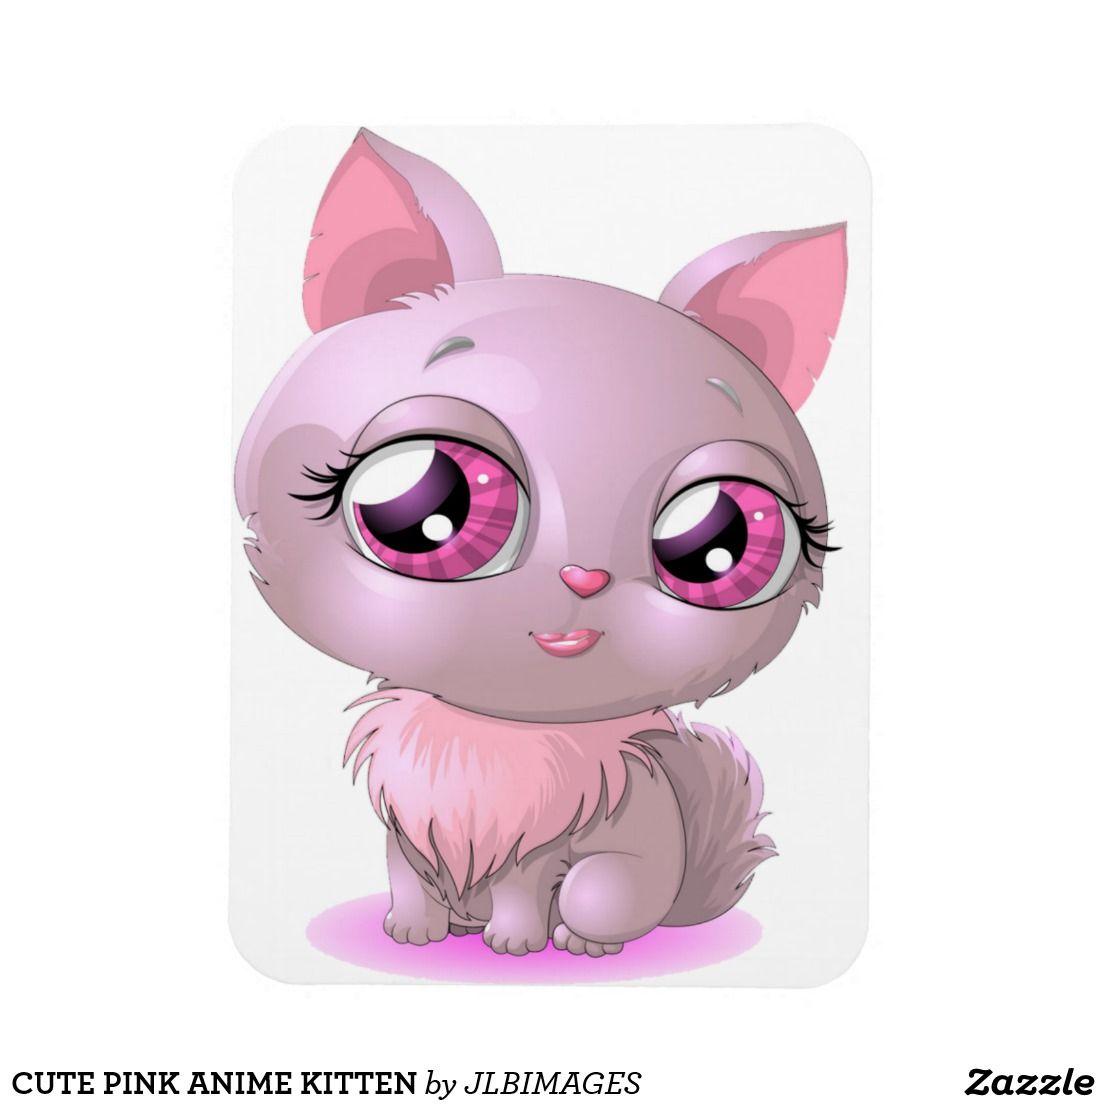 Cute Pink Anime Kitten Magnet Zazzle Com Anime Kitten Kitten